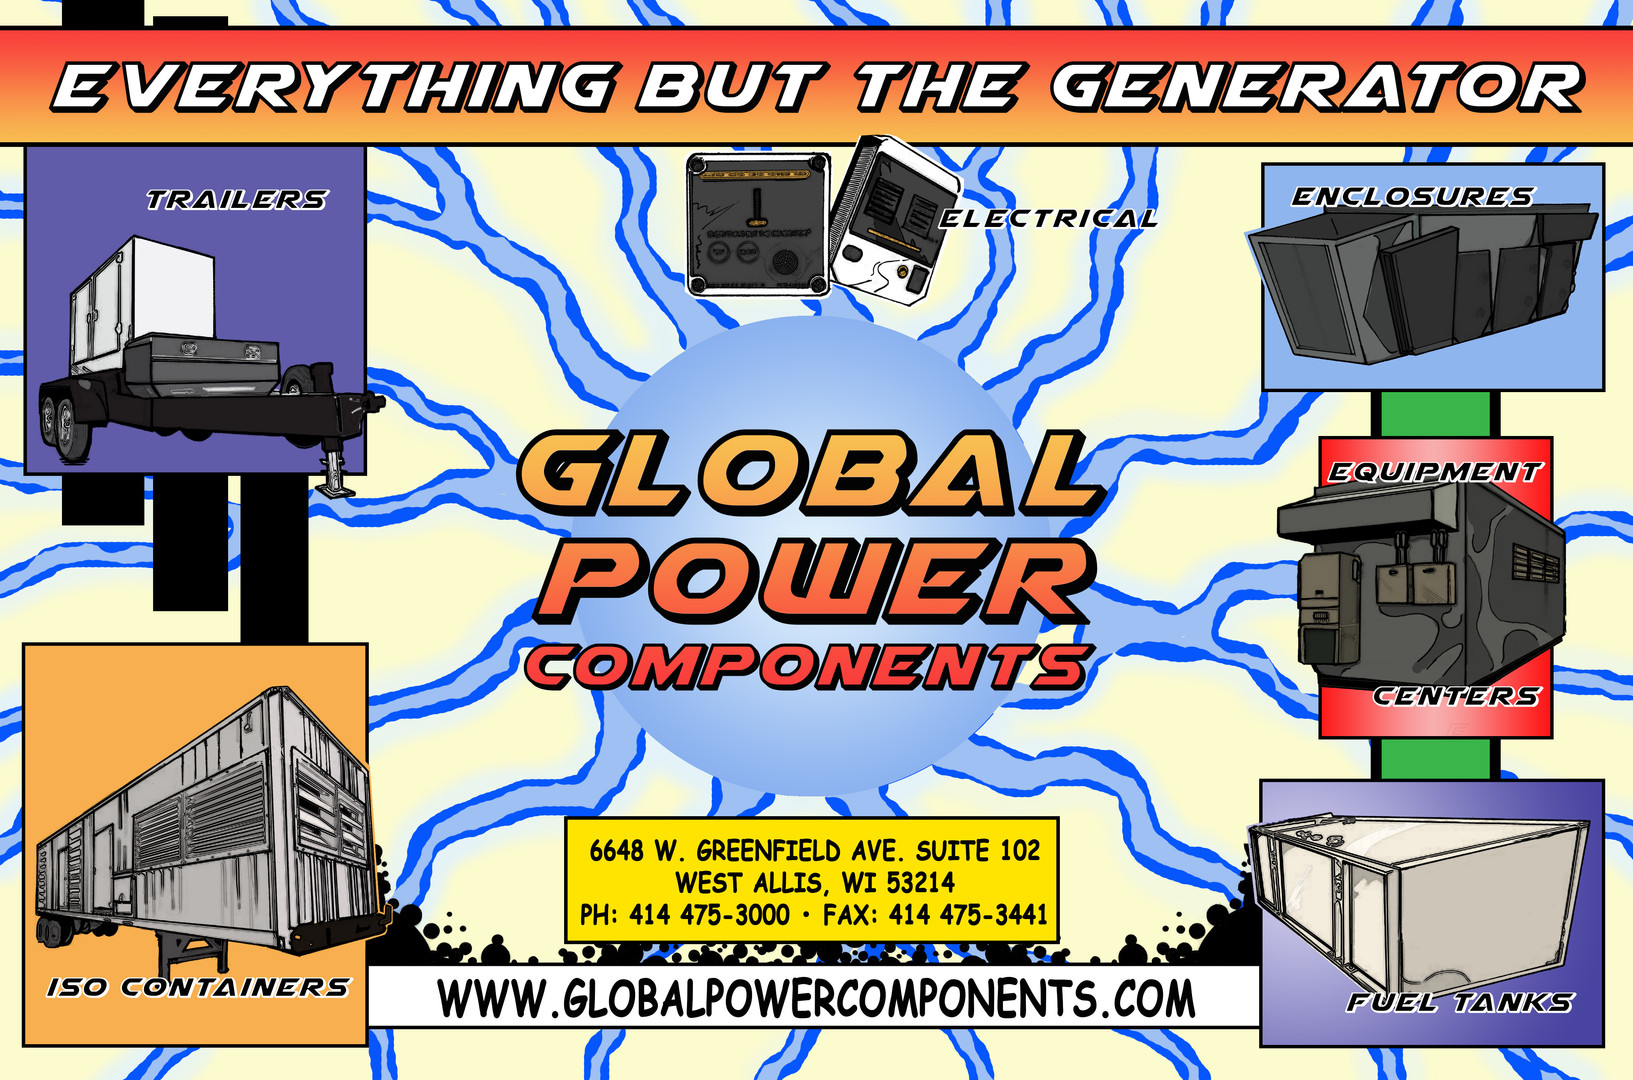 GPC gatefold ad 01.jpg